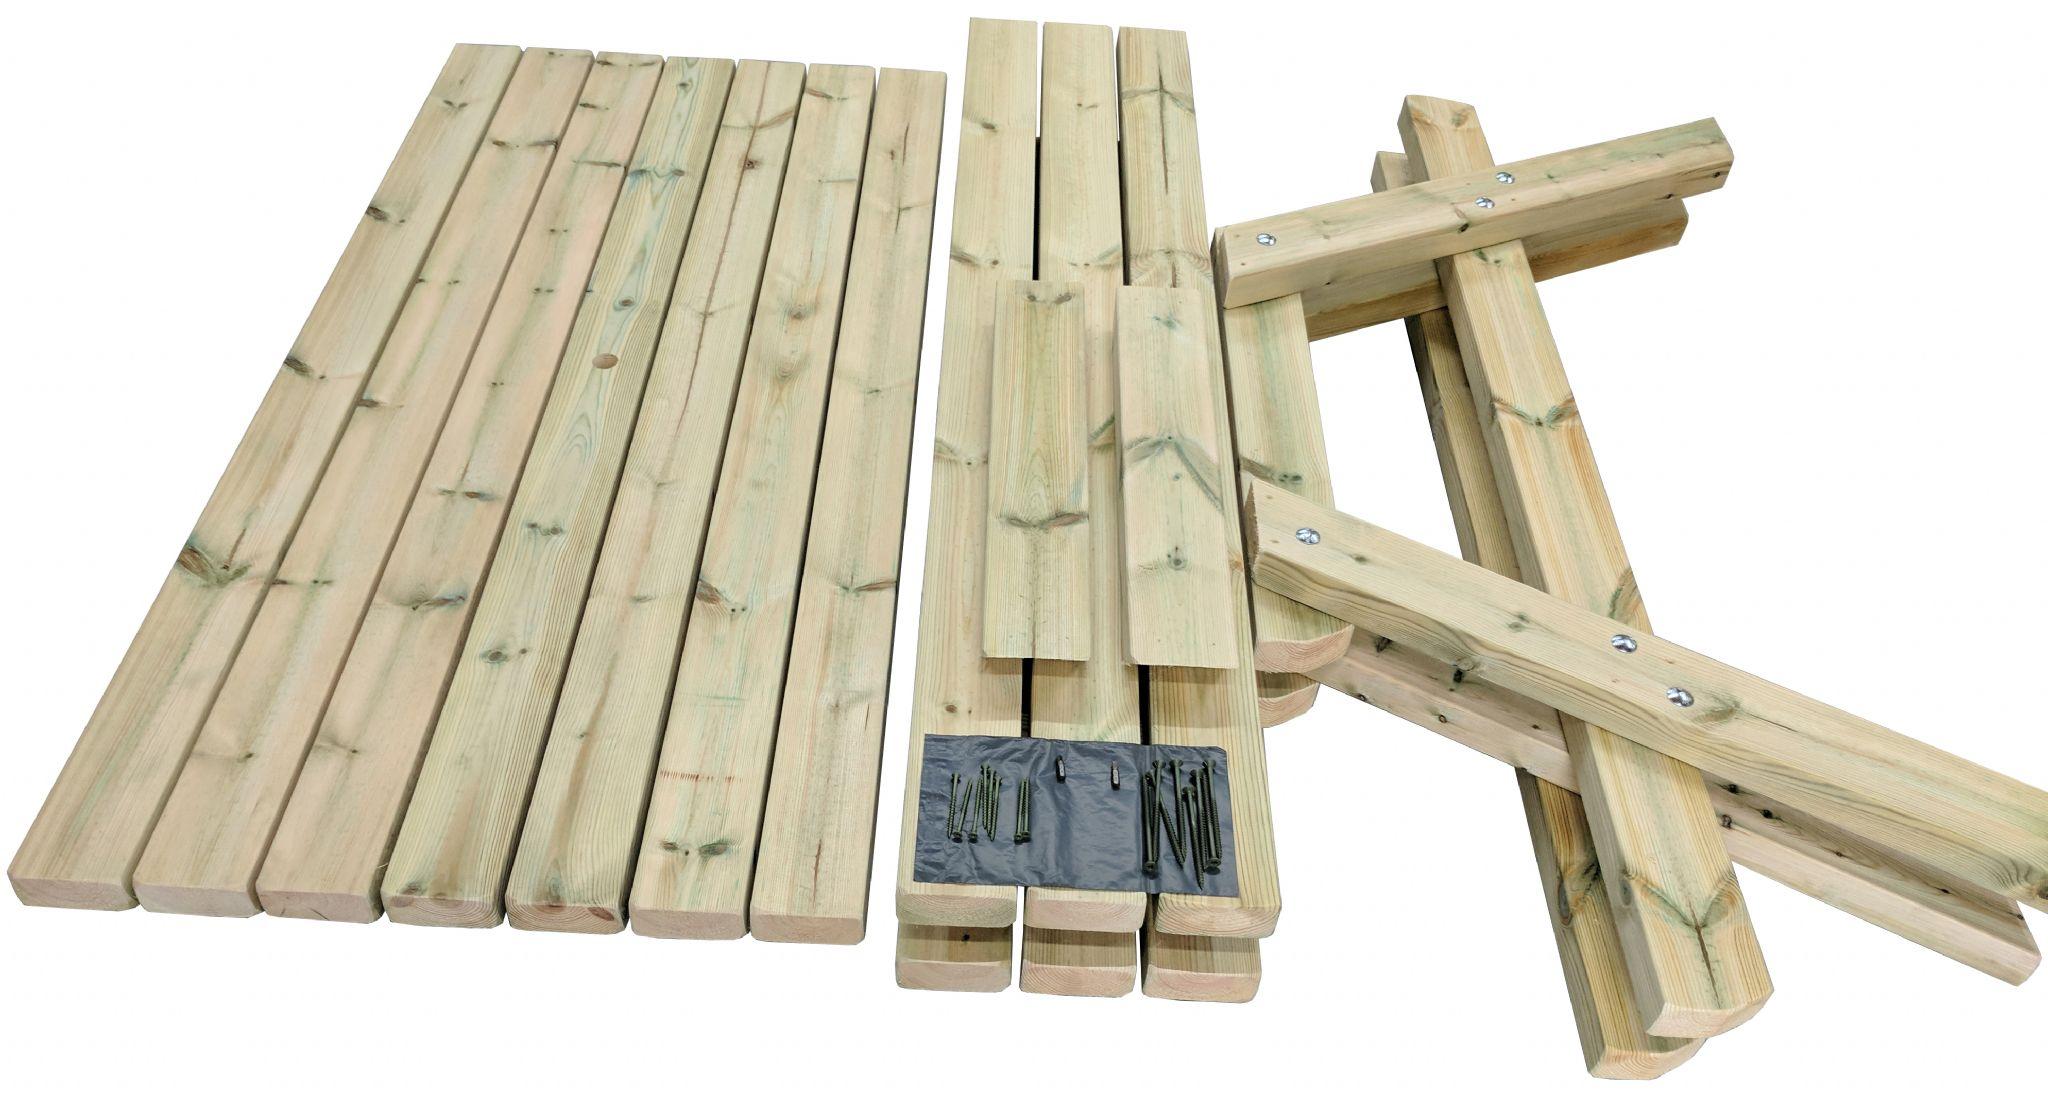 Mesa de picnic de madera con estructura en A desmontada